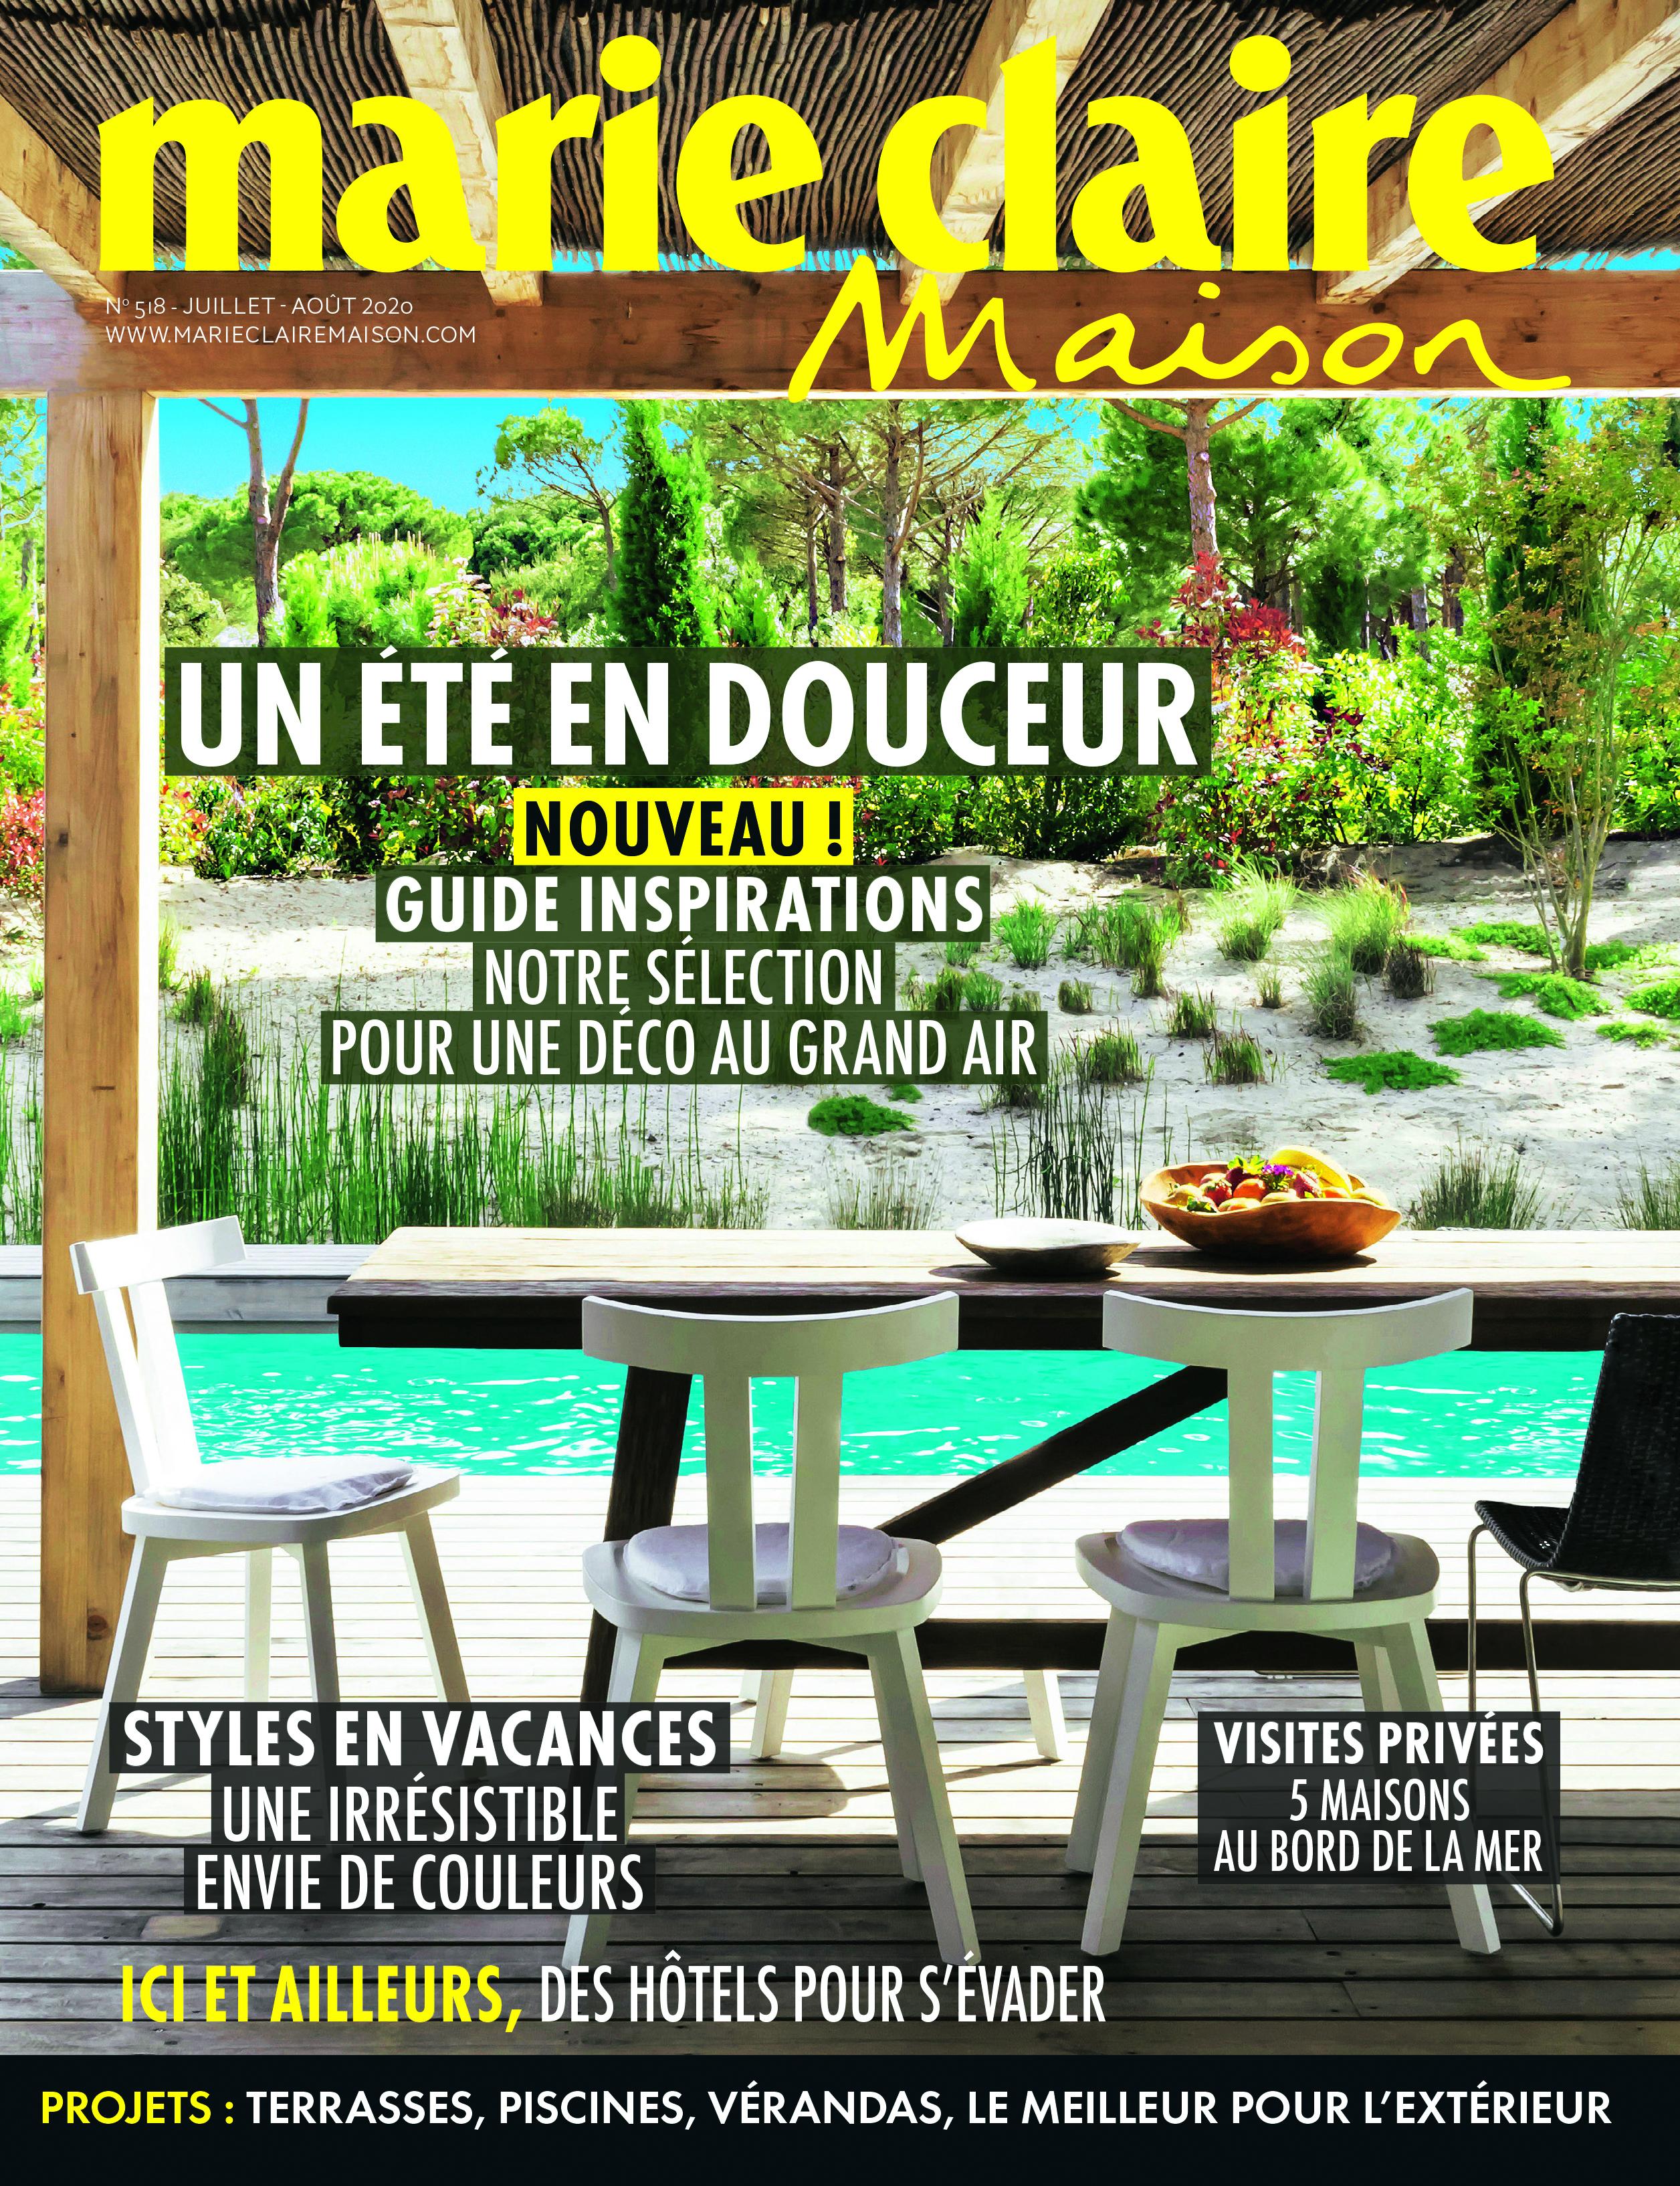 https://www.saota.com/wp-content/uploads/2021/05/2020_07_01_FR_MarieClaireMaison_Beyond_Cover.jpg